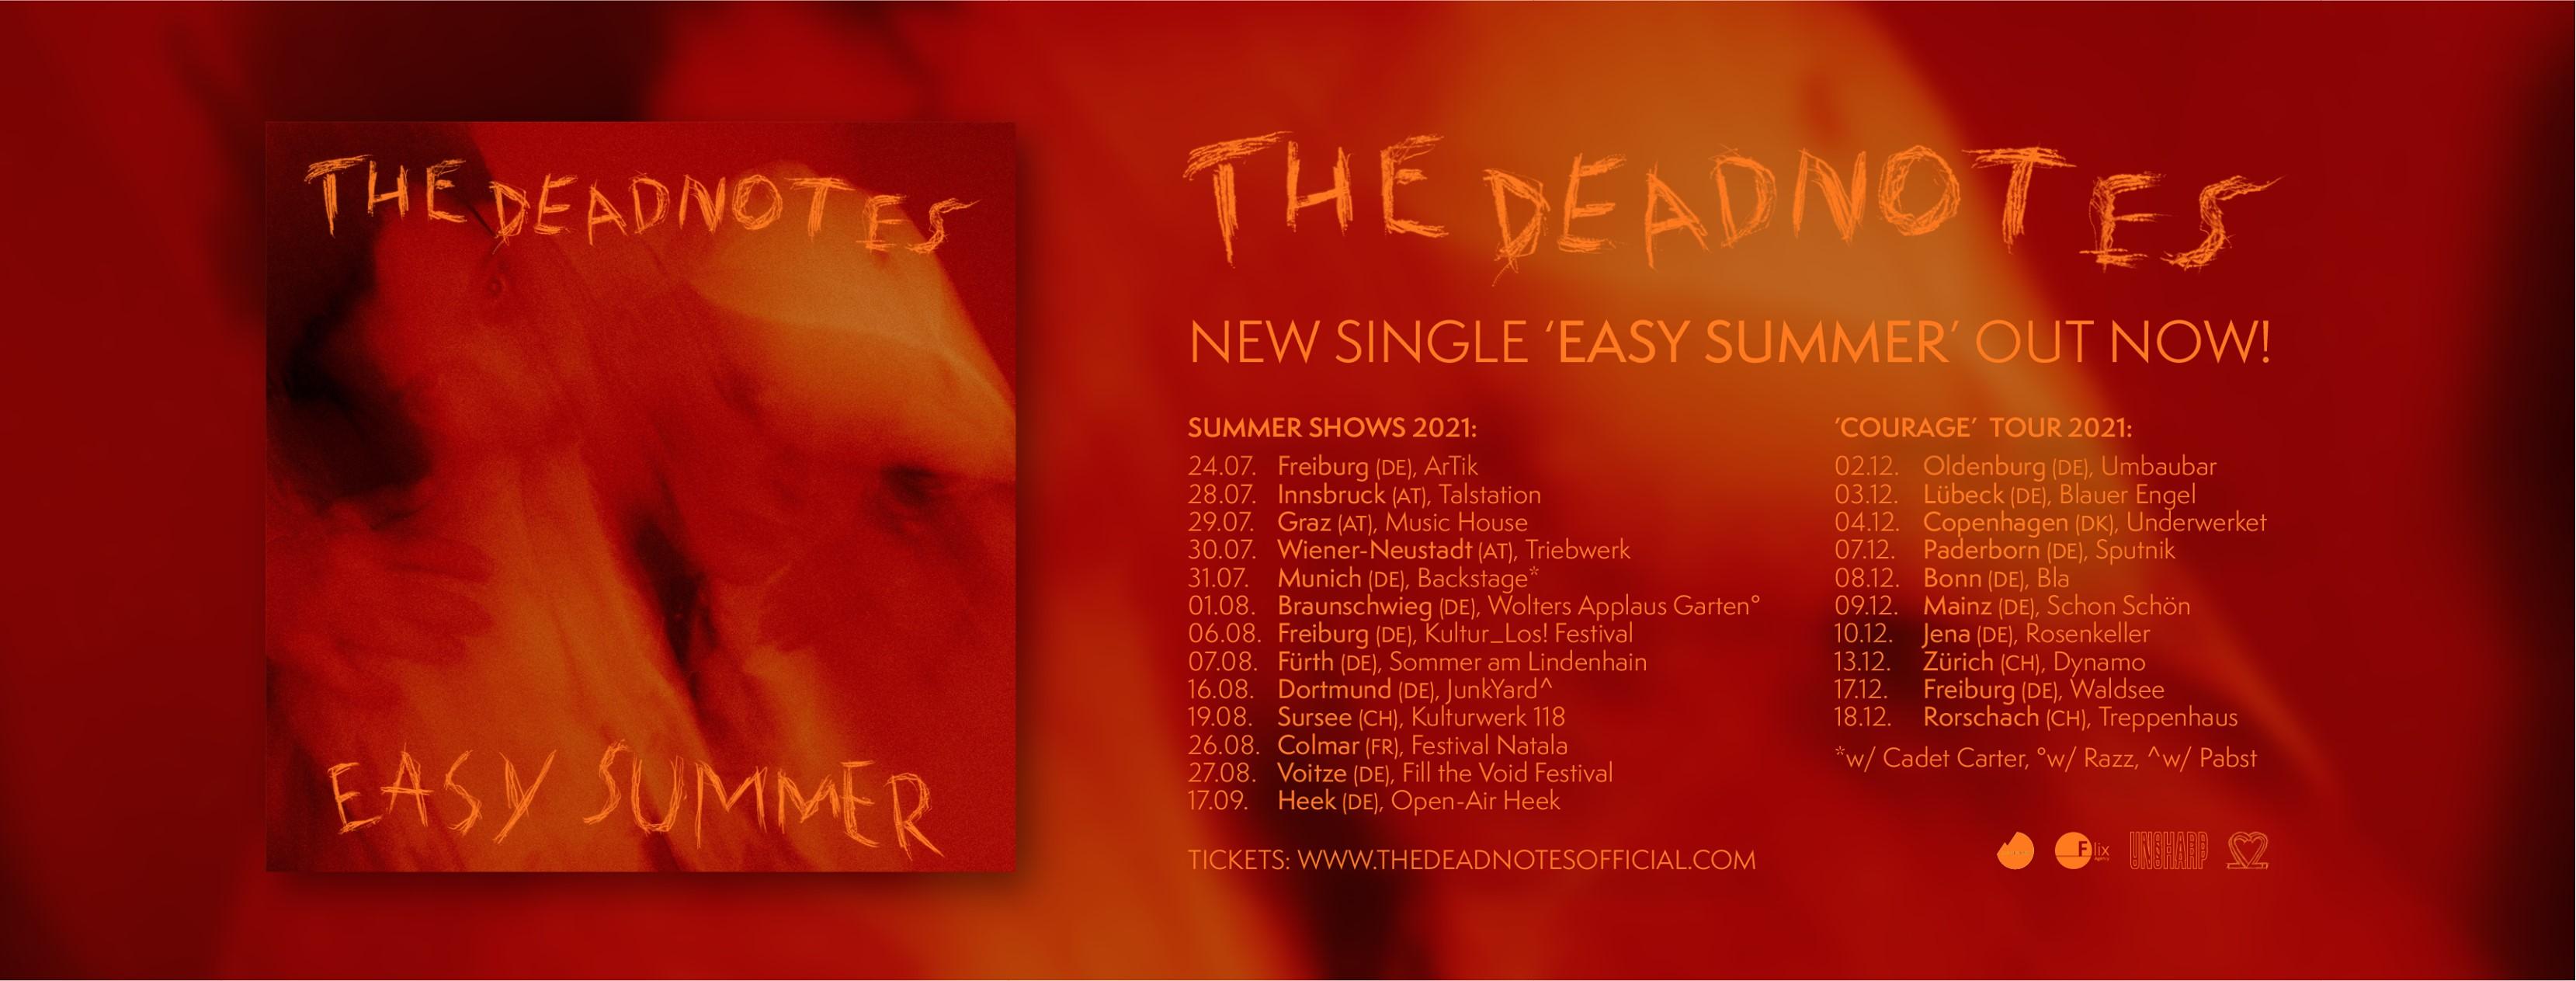 The Deadnotes - Tour